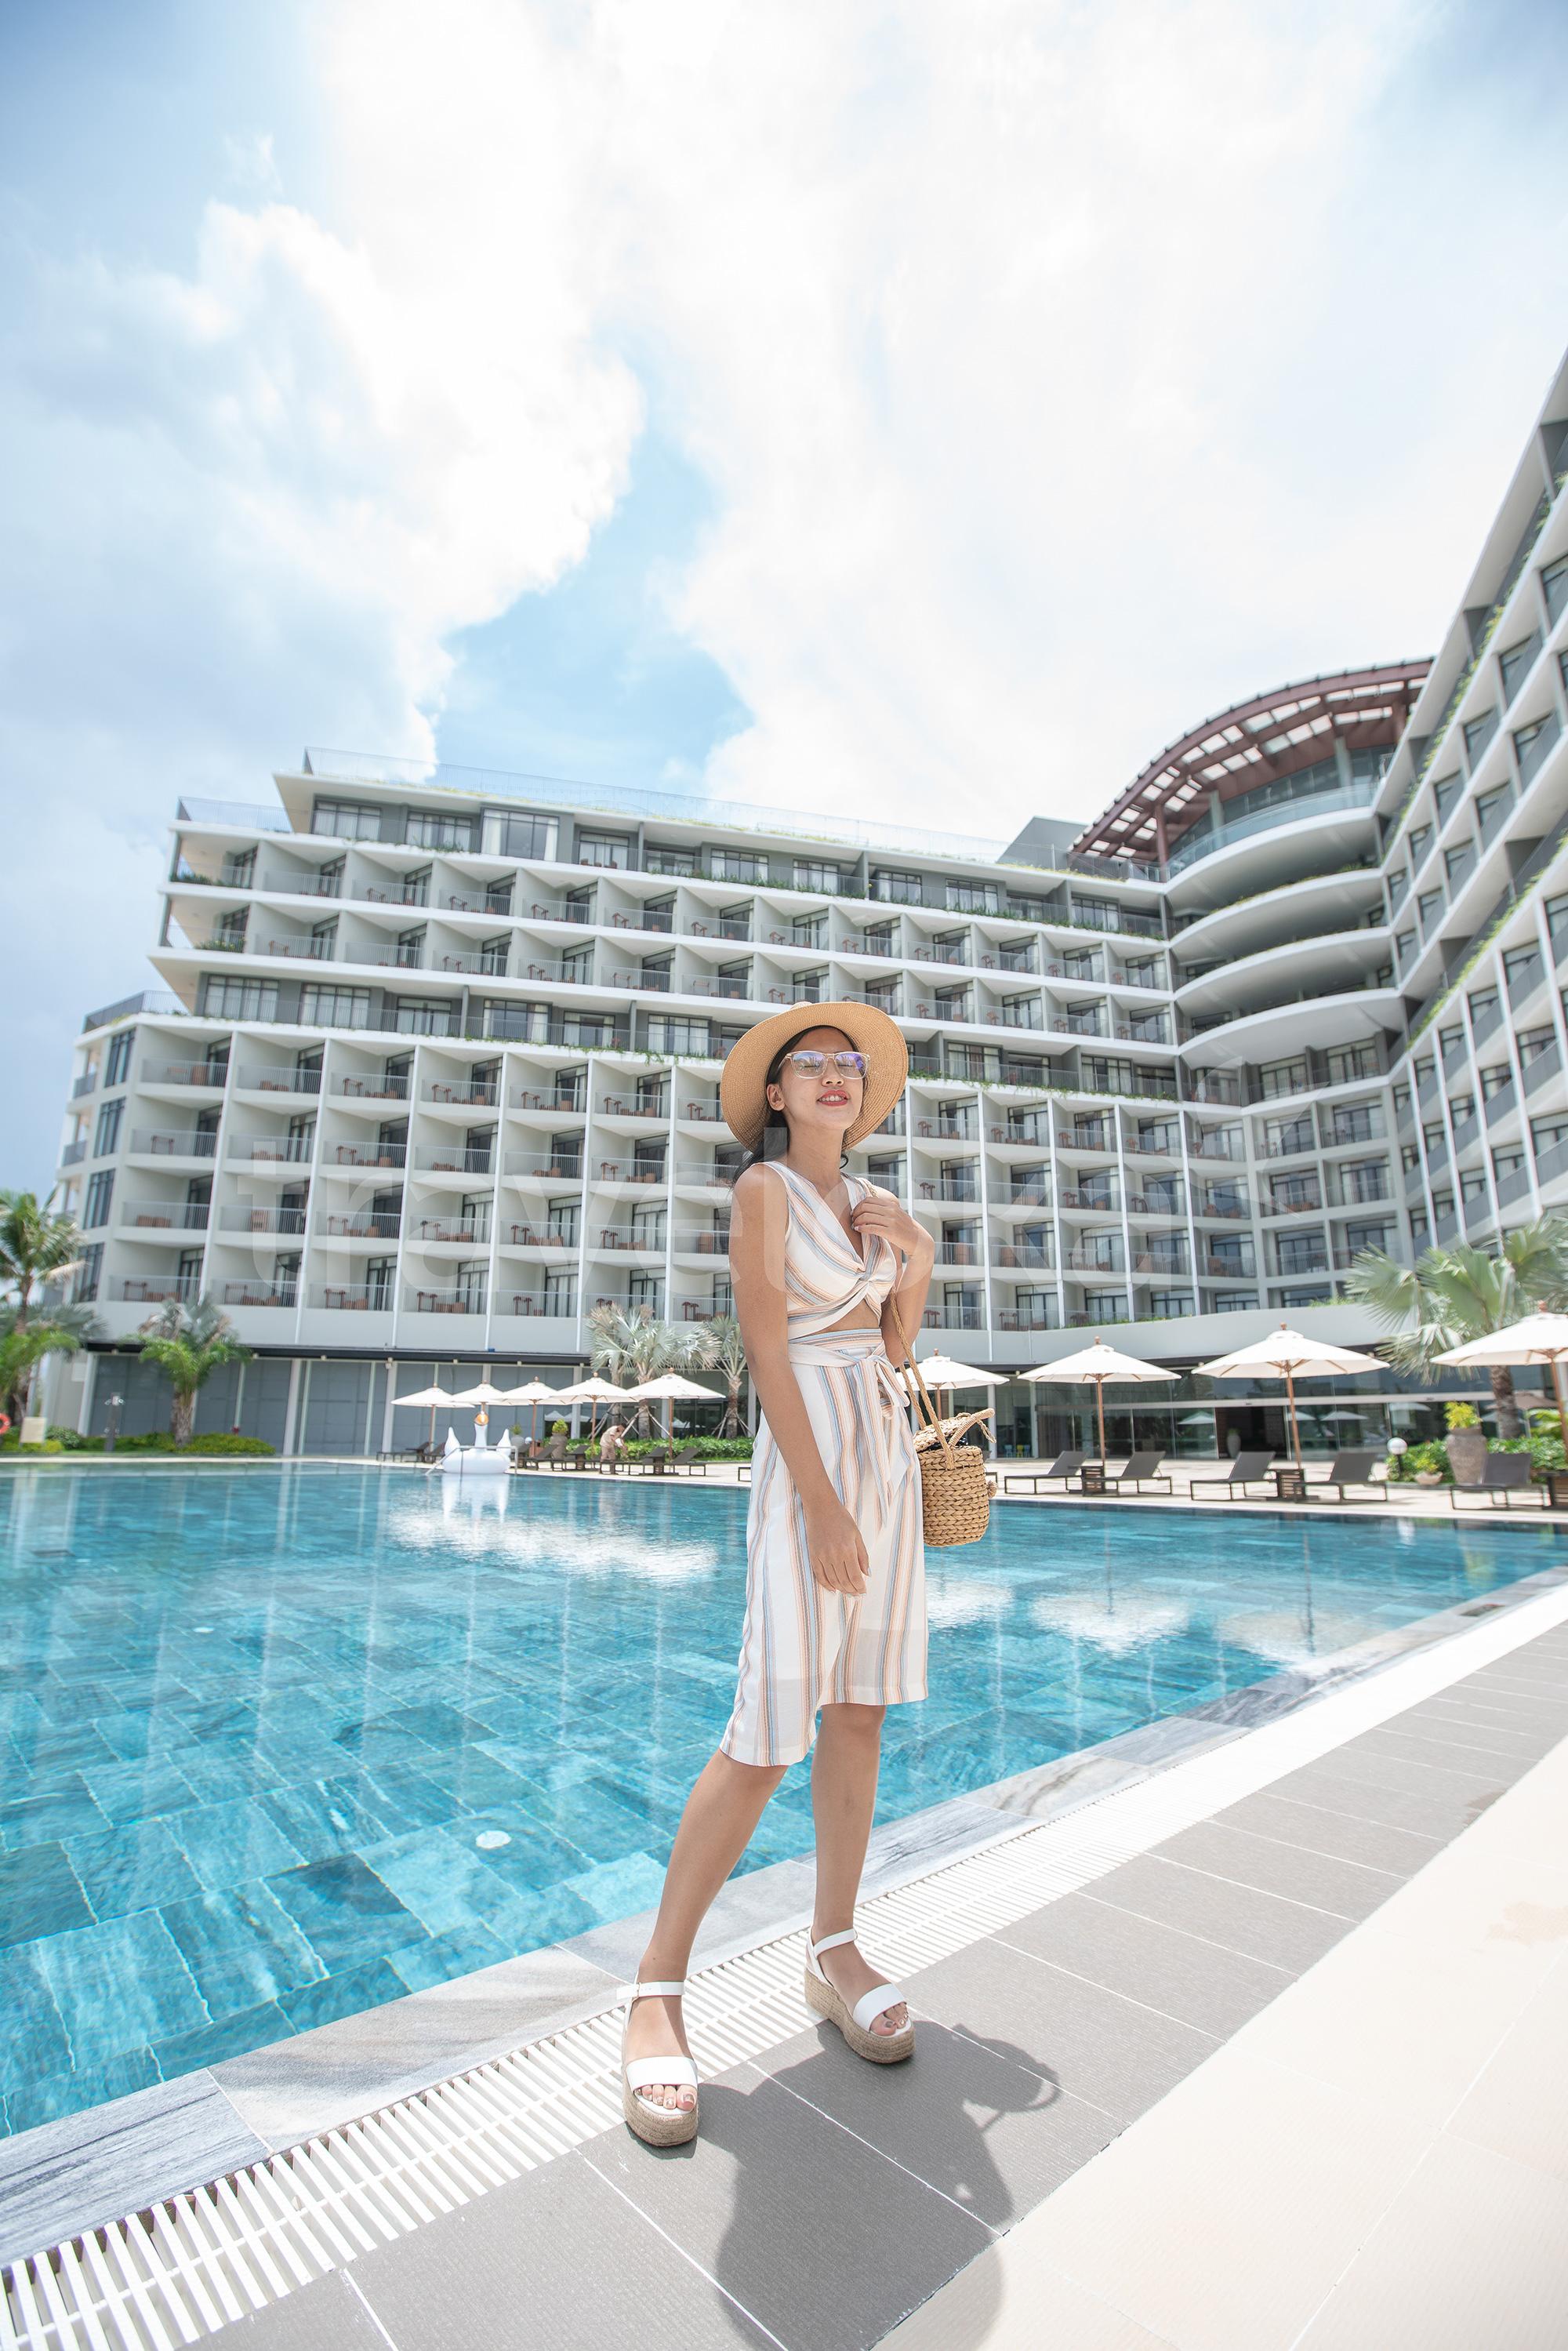 Cẩm nang du lịch Phú Quốc - Best Western Premier Sonasea Phu Quoc Resort